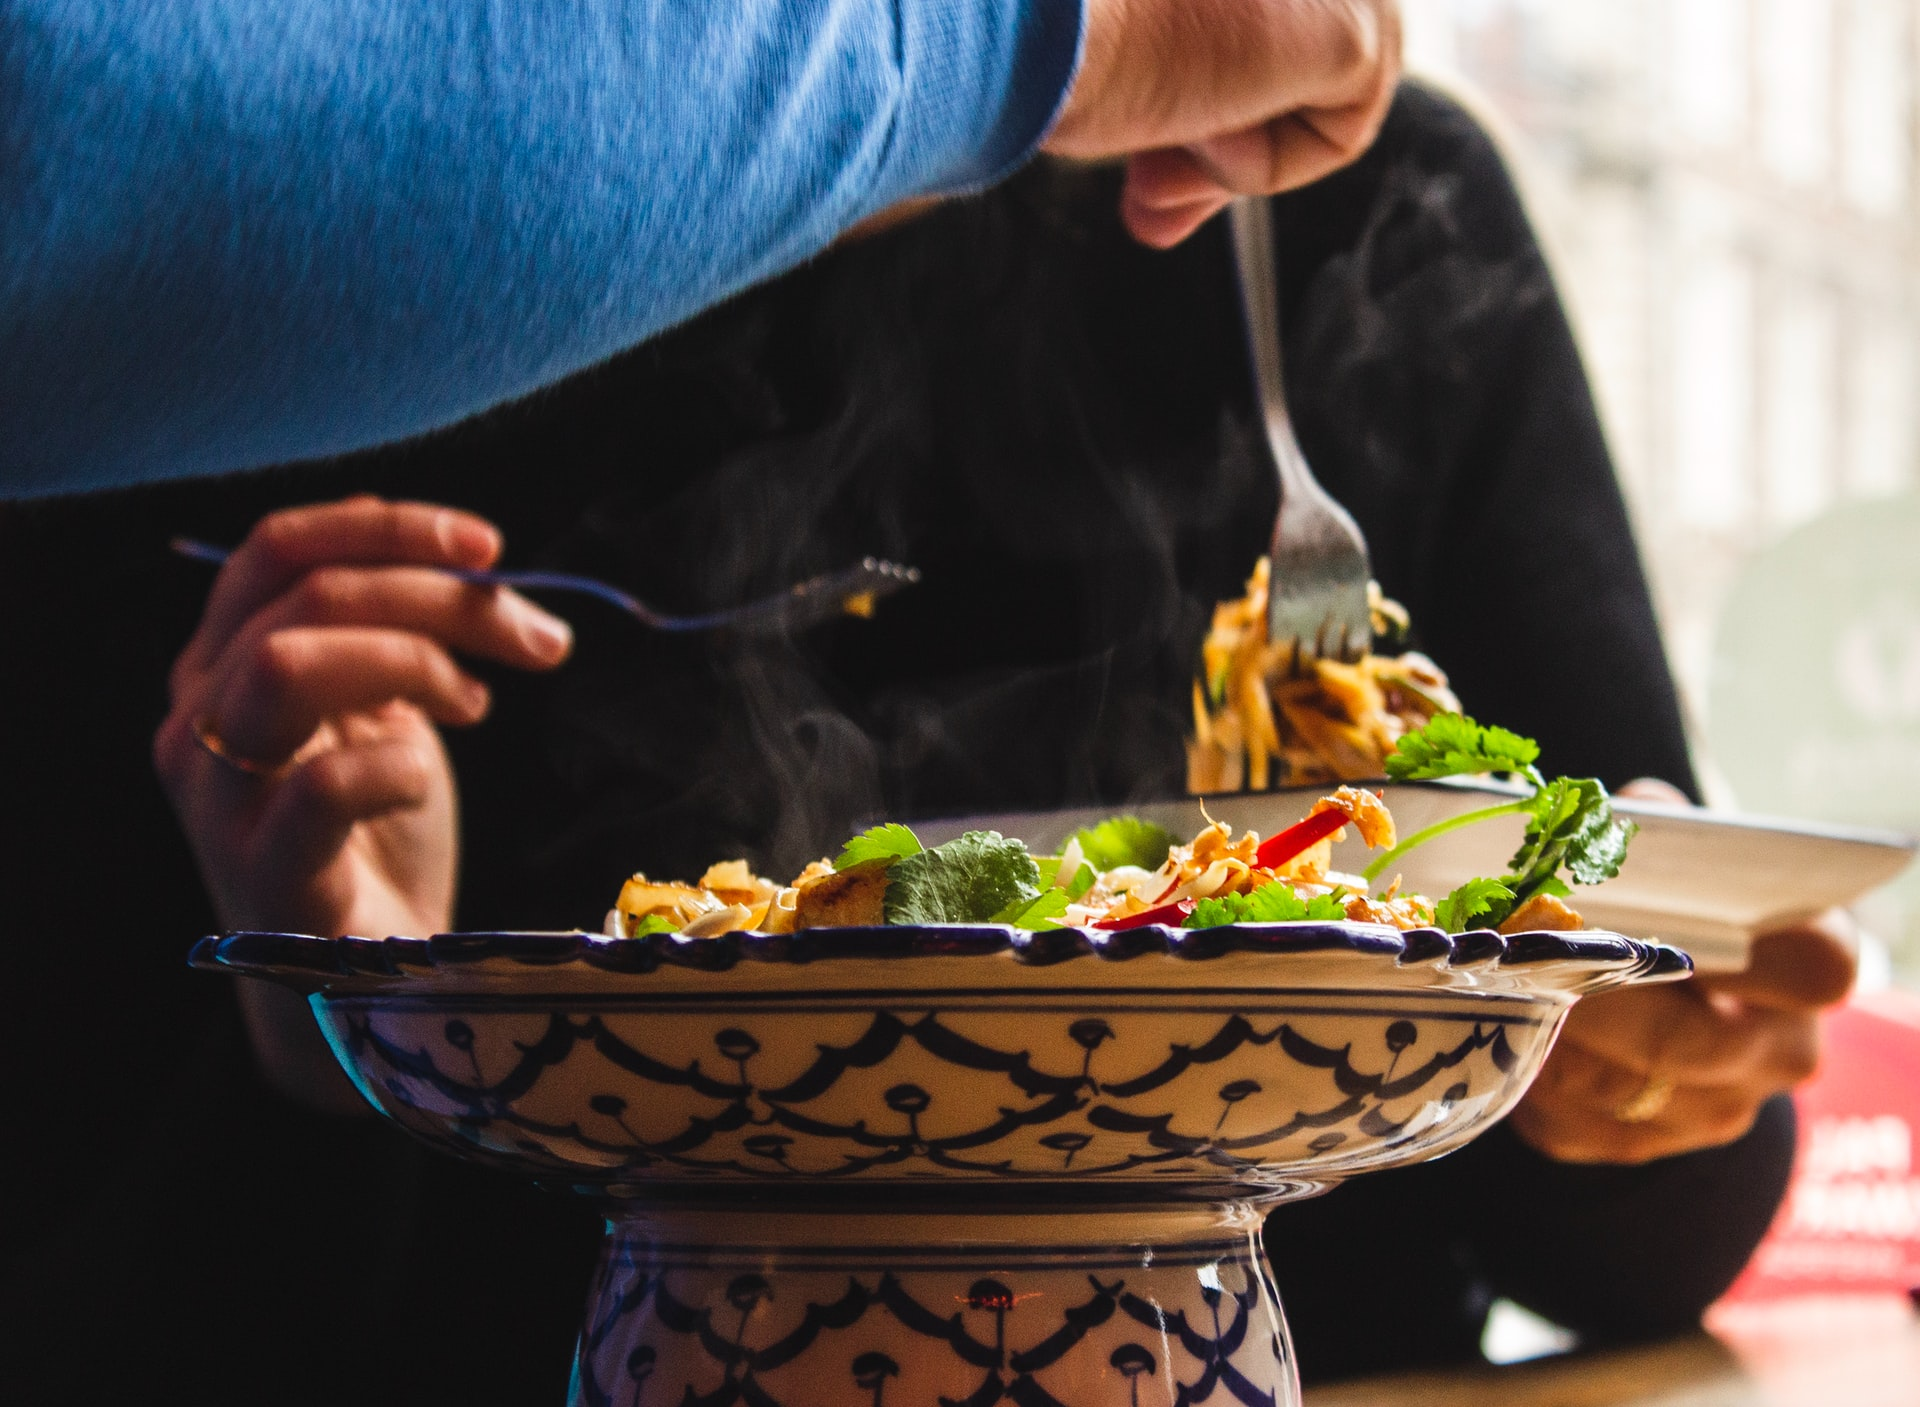 How Health Foods Went Mainstream